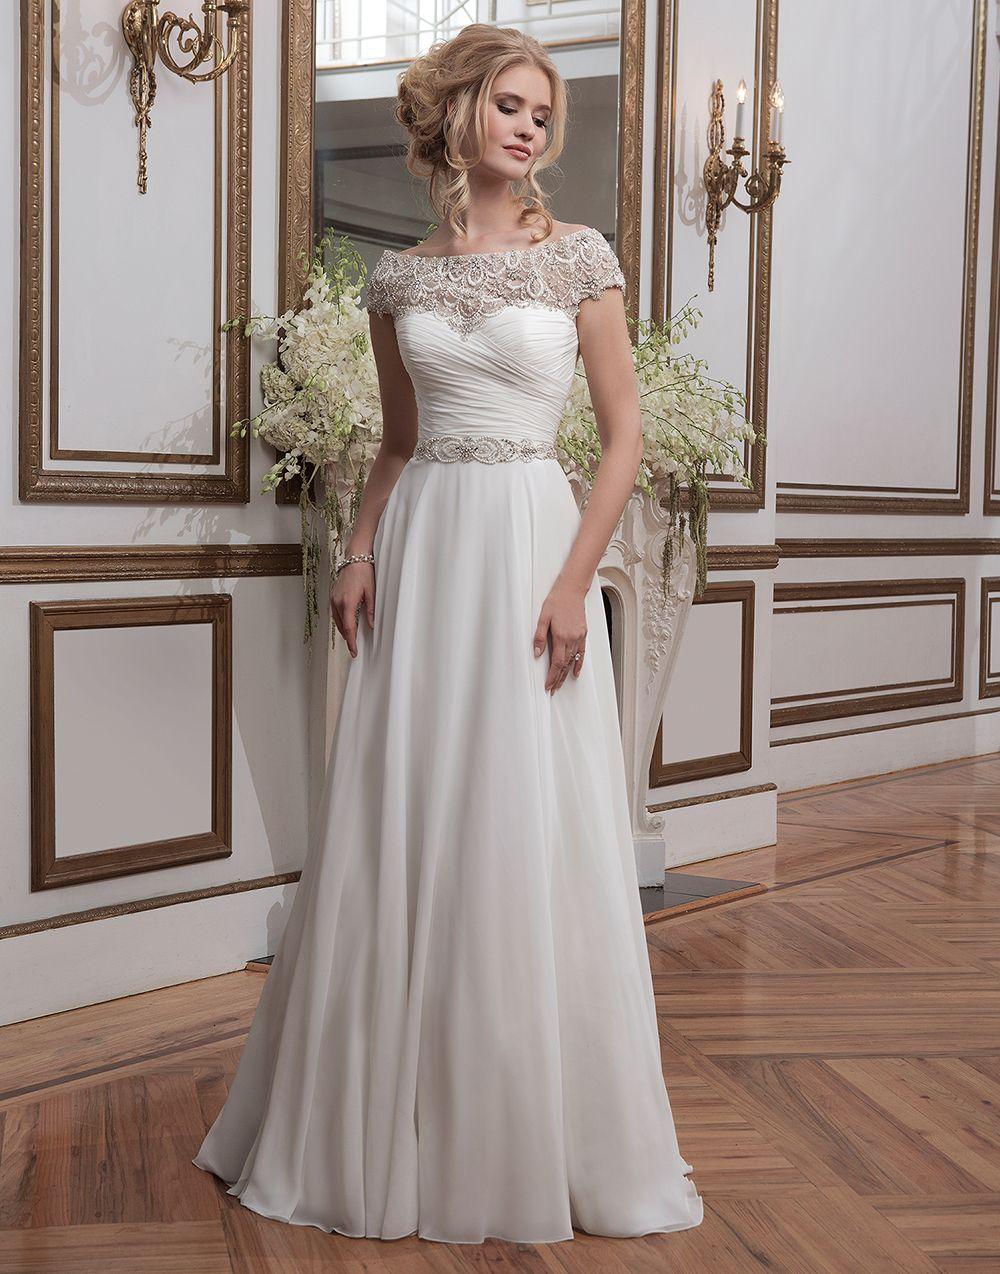 Justin alexander wedding dresses style ball gowns neckline